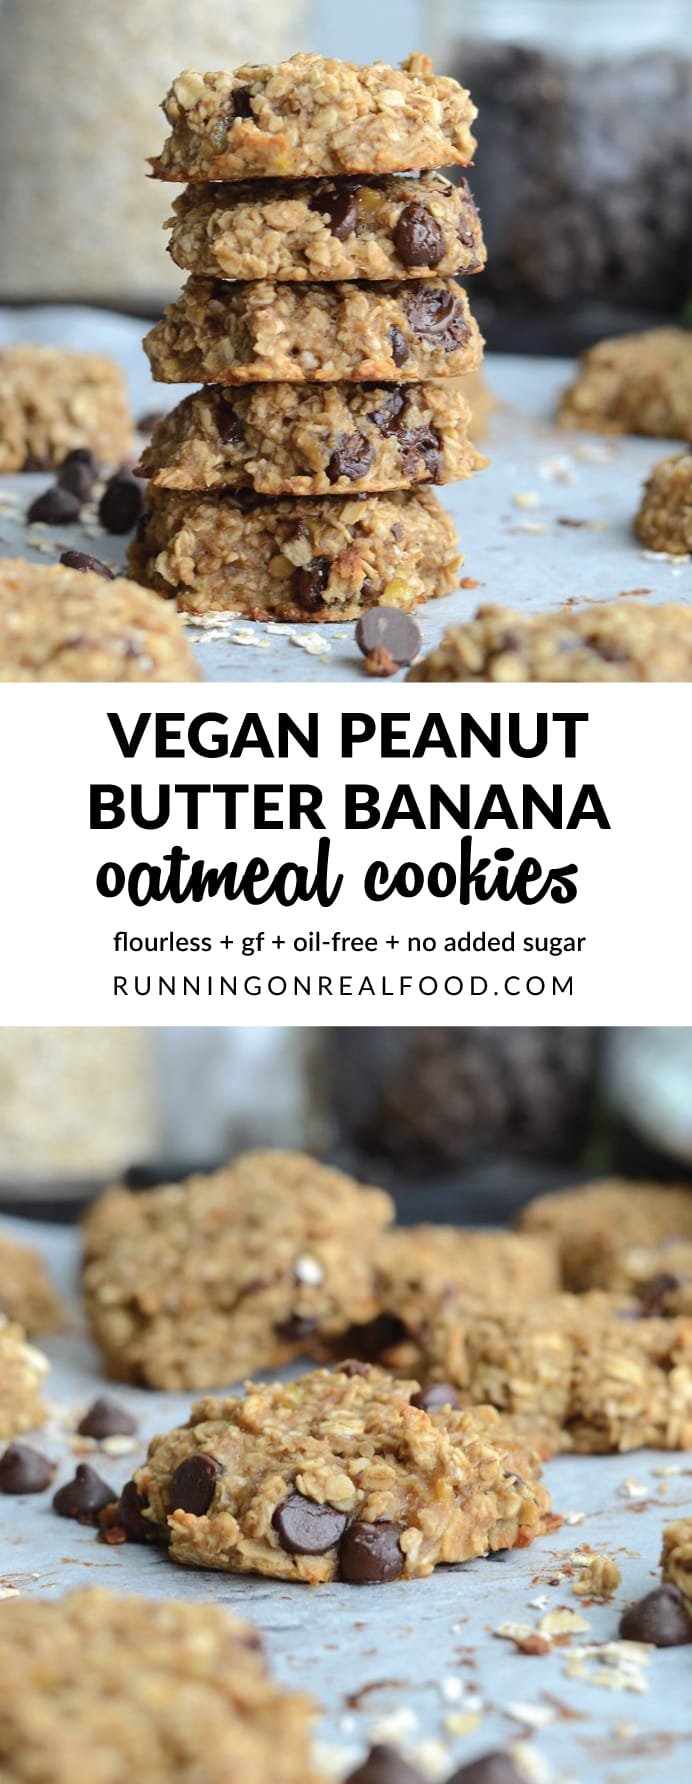 Flourless Peanut Butter Banana Oat Cookies - Just 3 Ingredients!